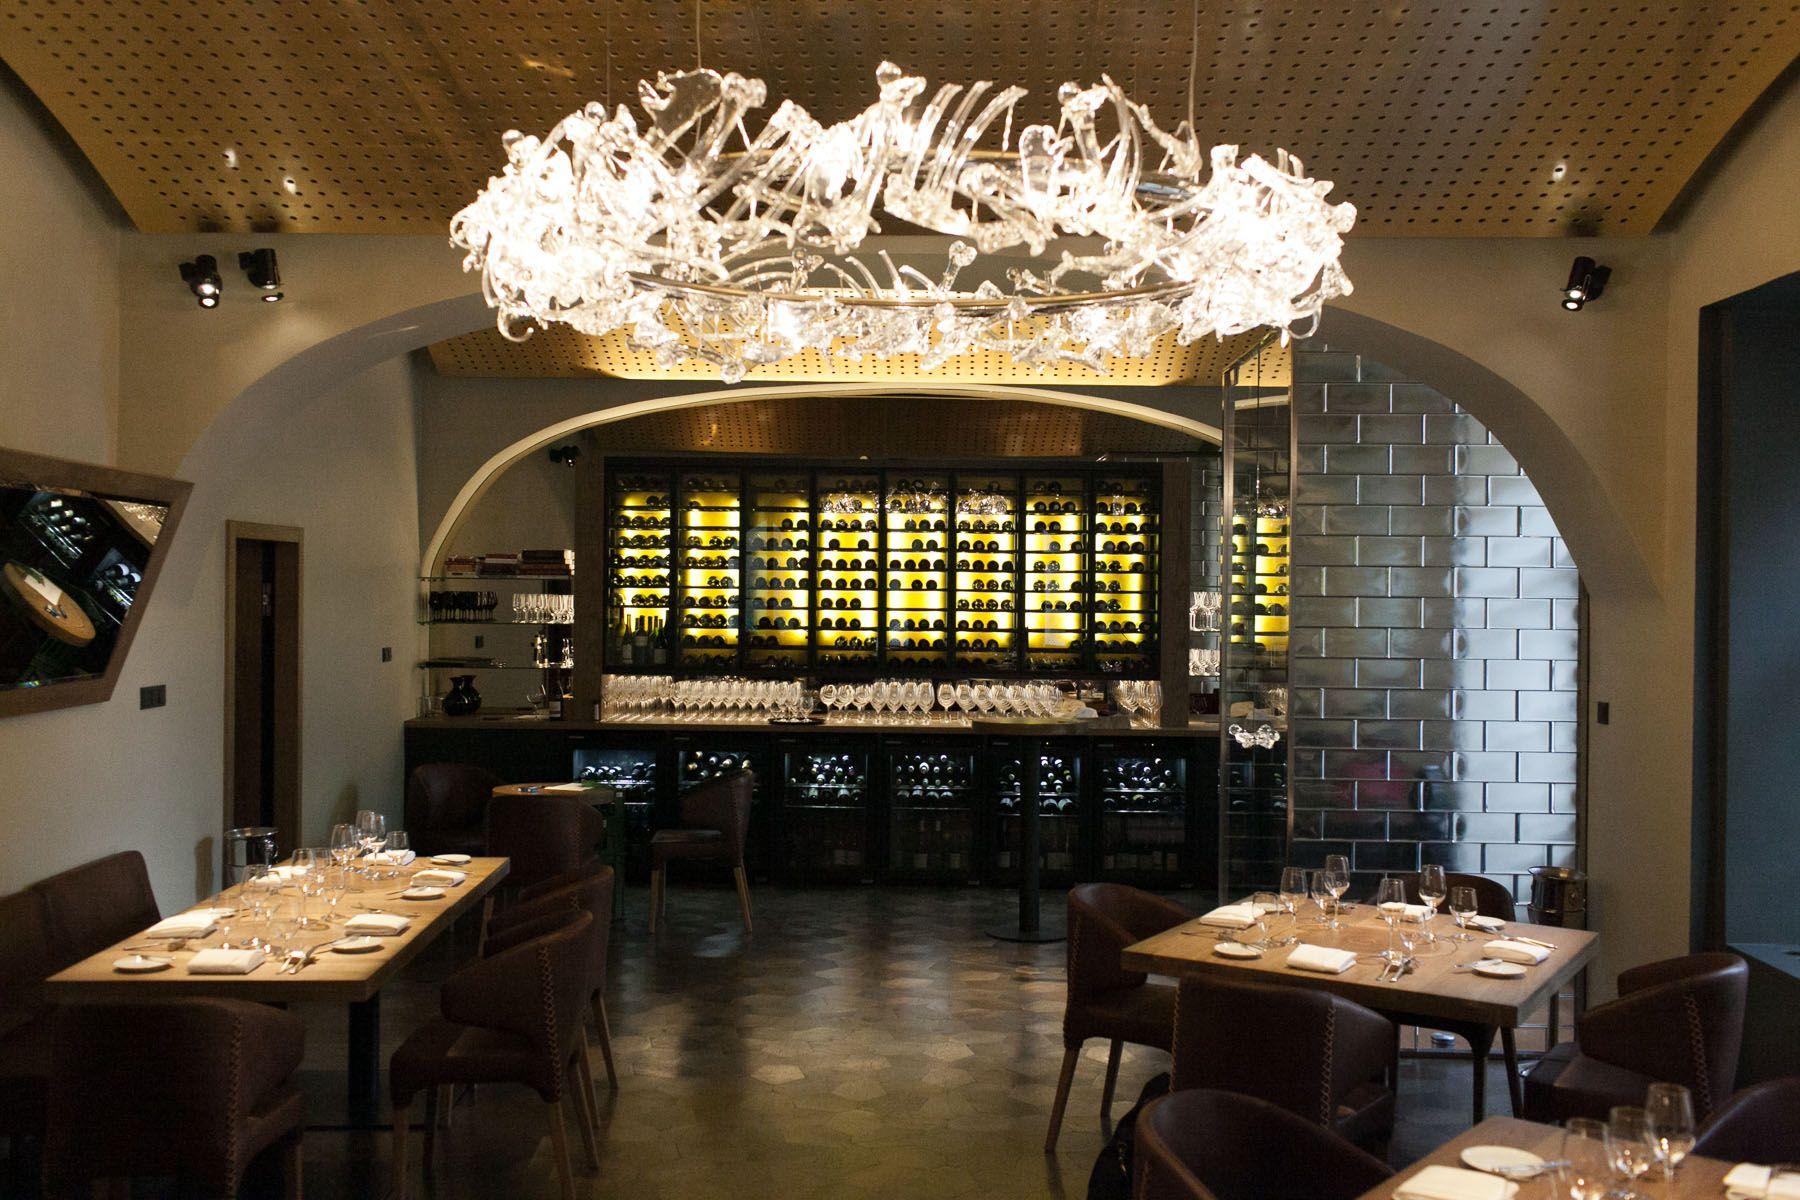 caprice A praha train Prague Michelin star restaurants guide